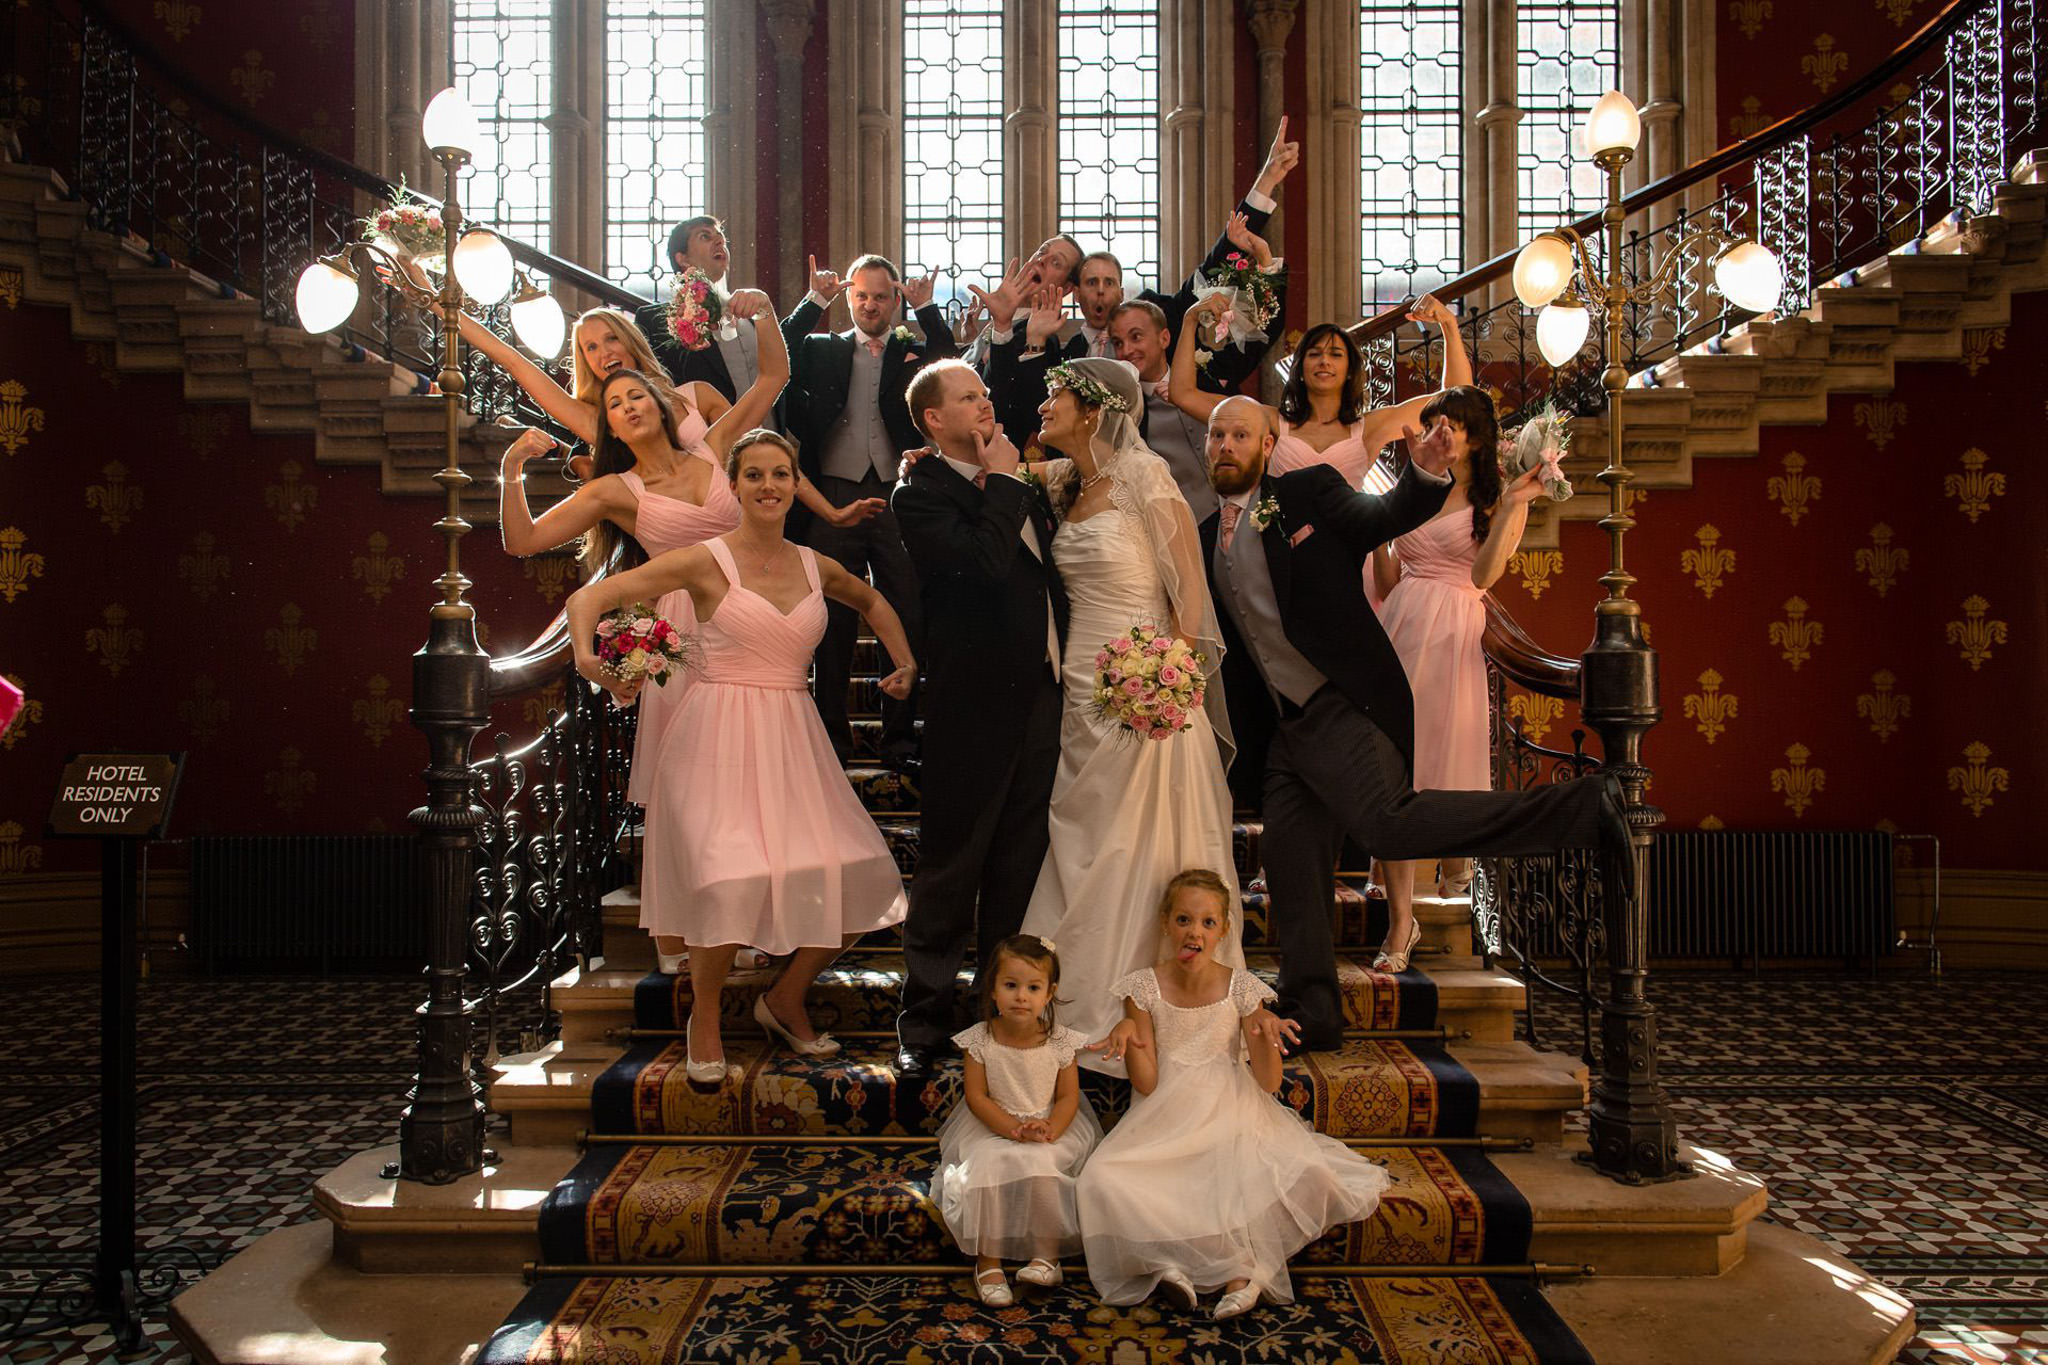 St. Pancras hotel wedding crazy group shot